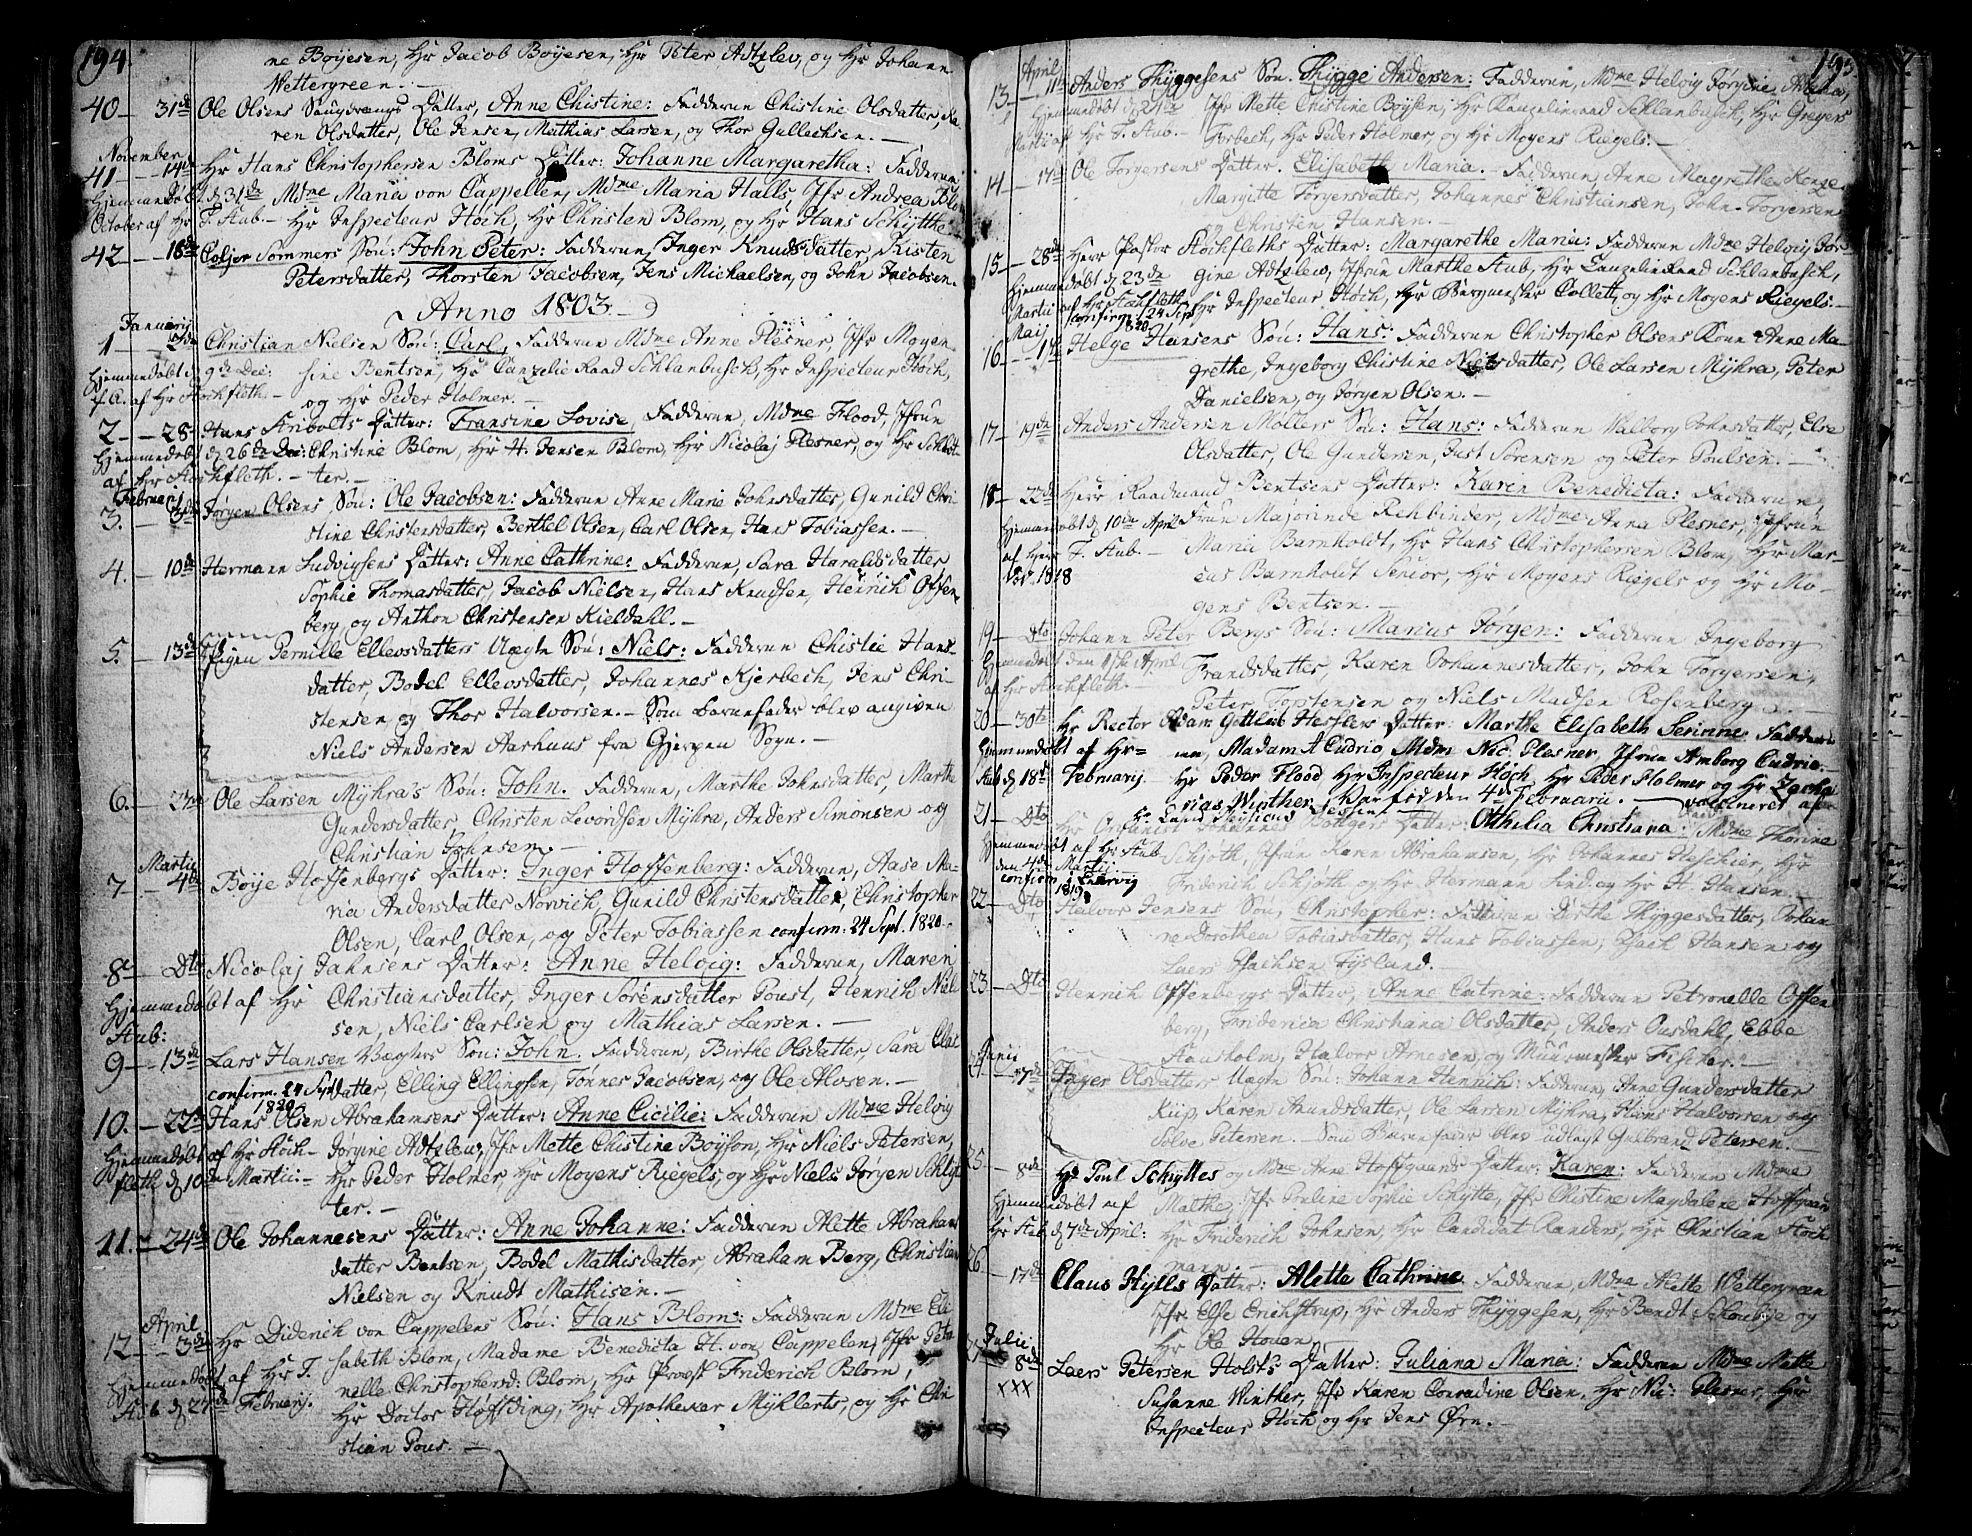 SAKO, Skien kirkebøker, F/Fa/L0004: Parish register (official) no. 4, 1792-1814, p. 194-195